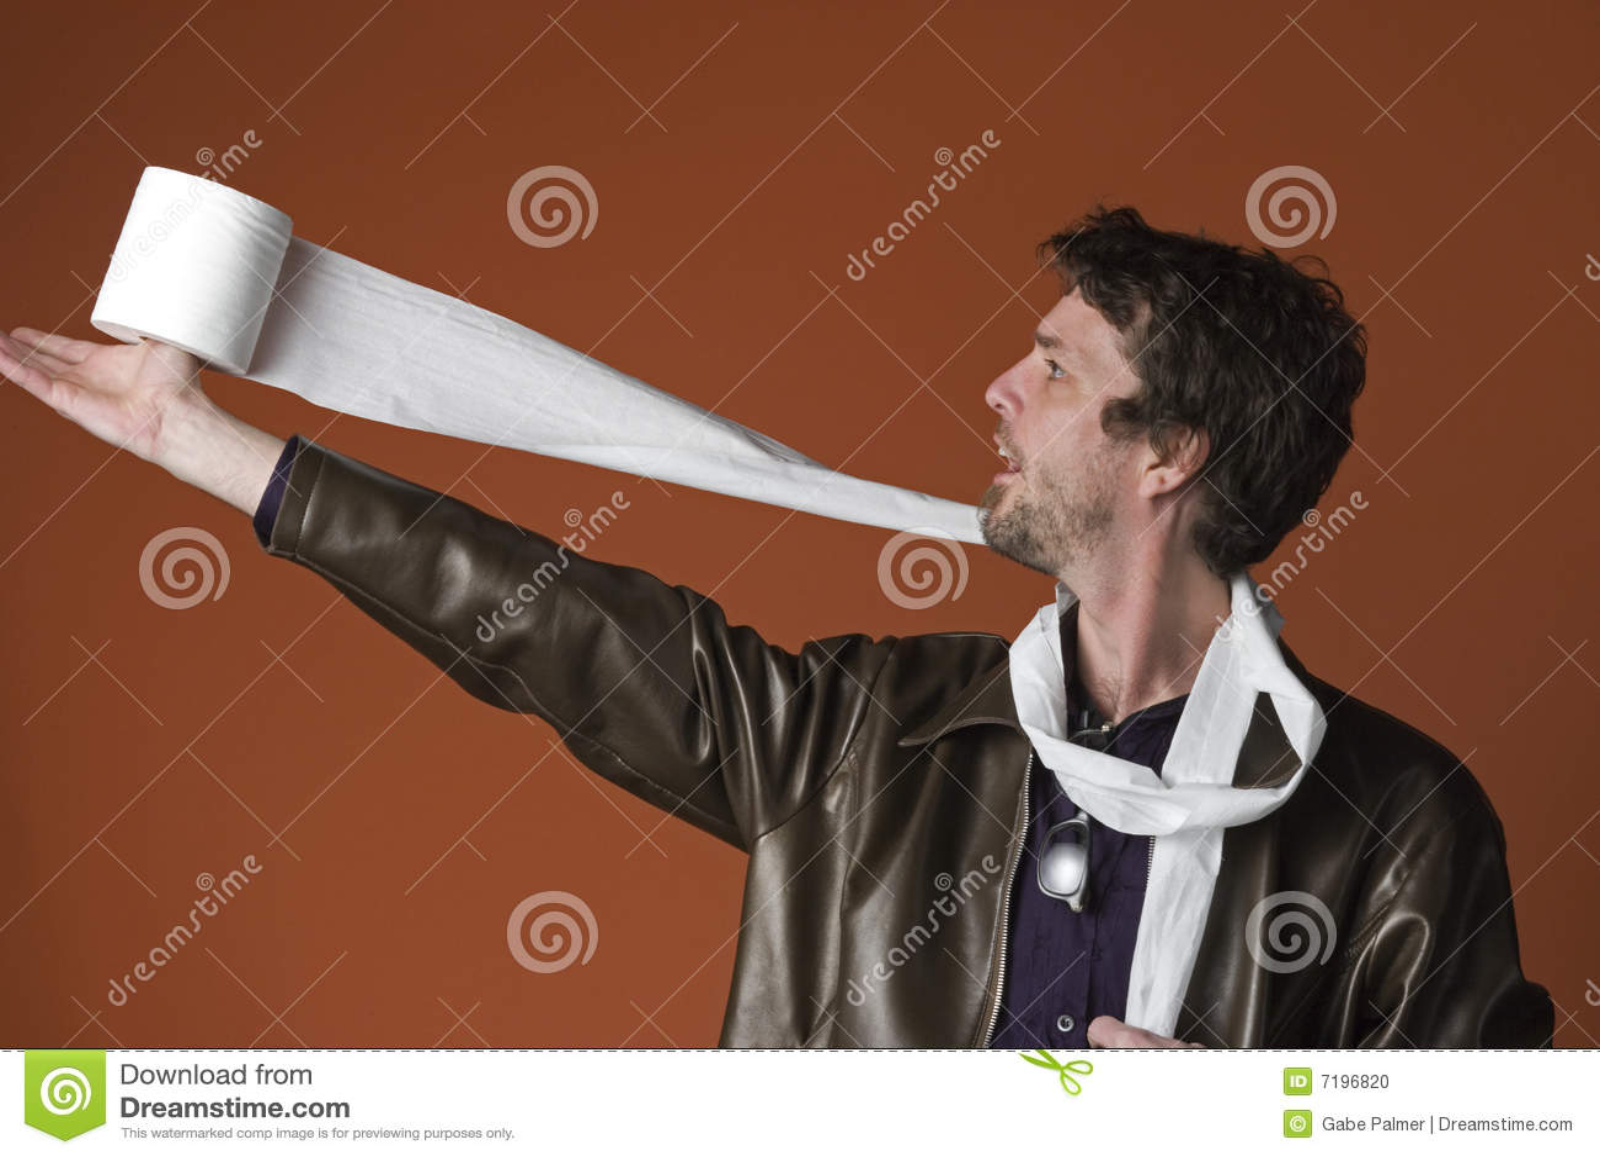 Man paper plays toilet